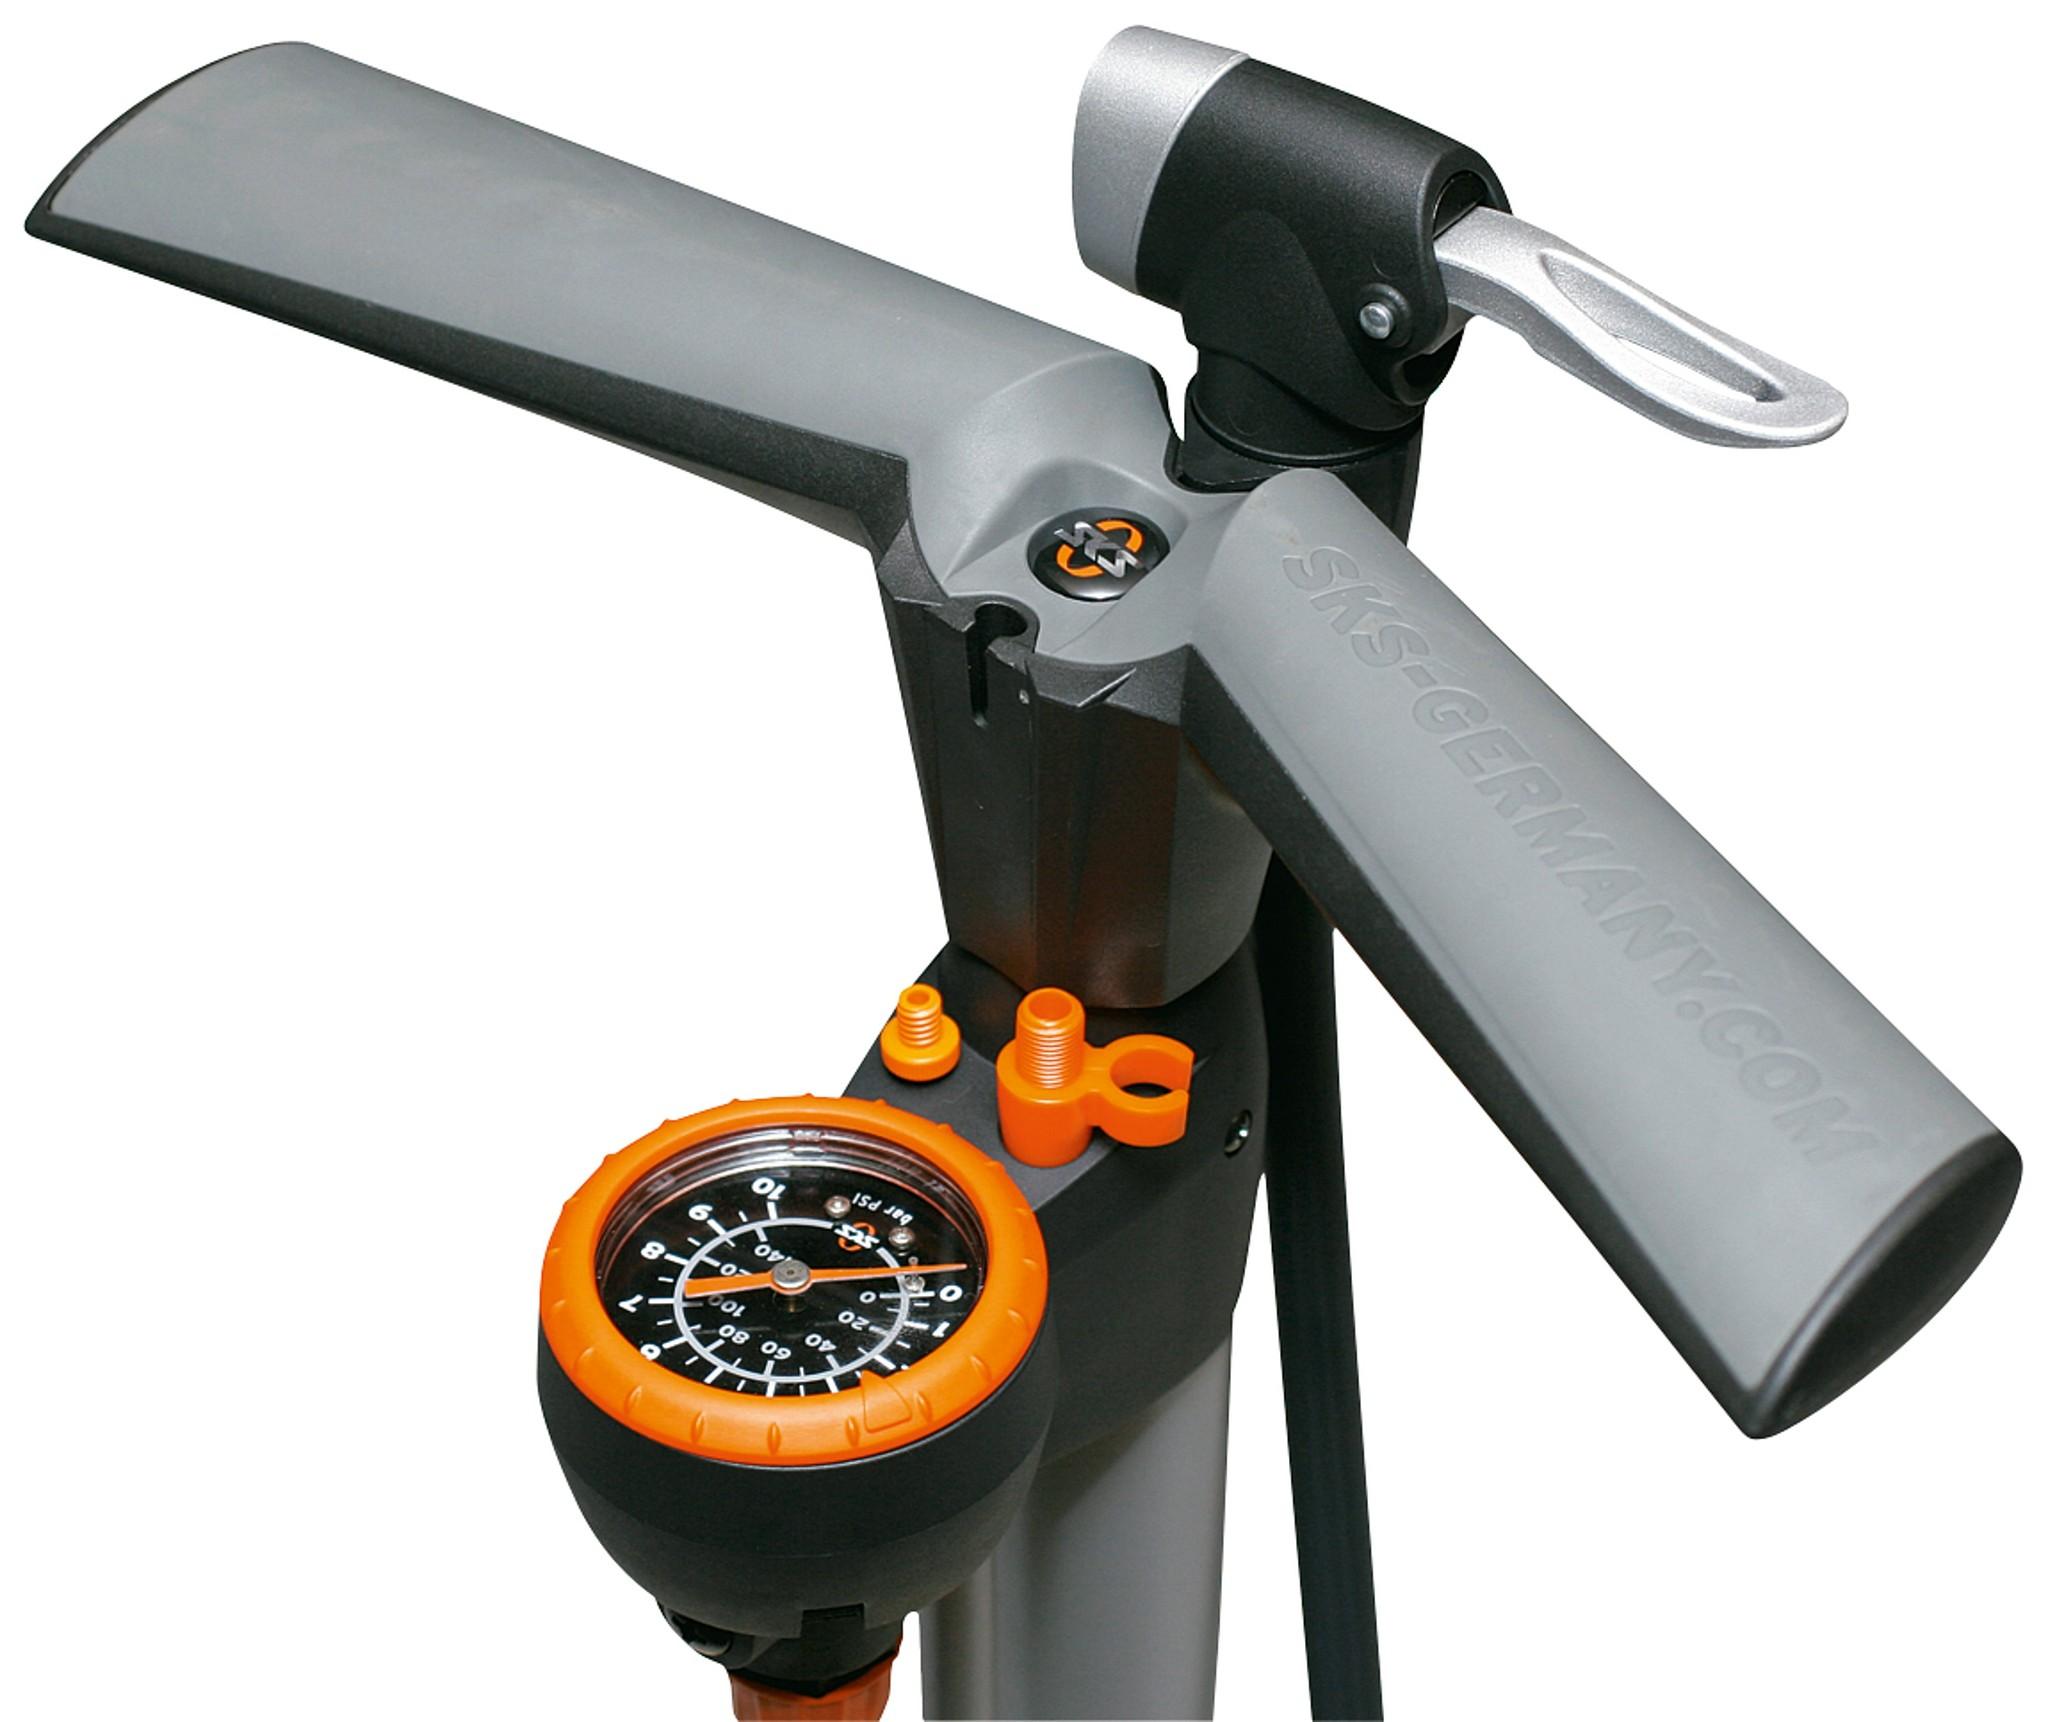 Airworx 10.0 Vloerpomp Oranje